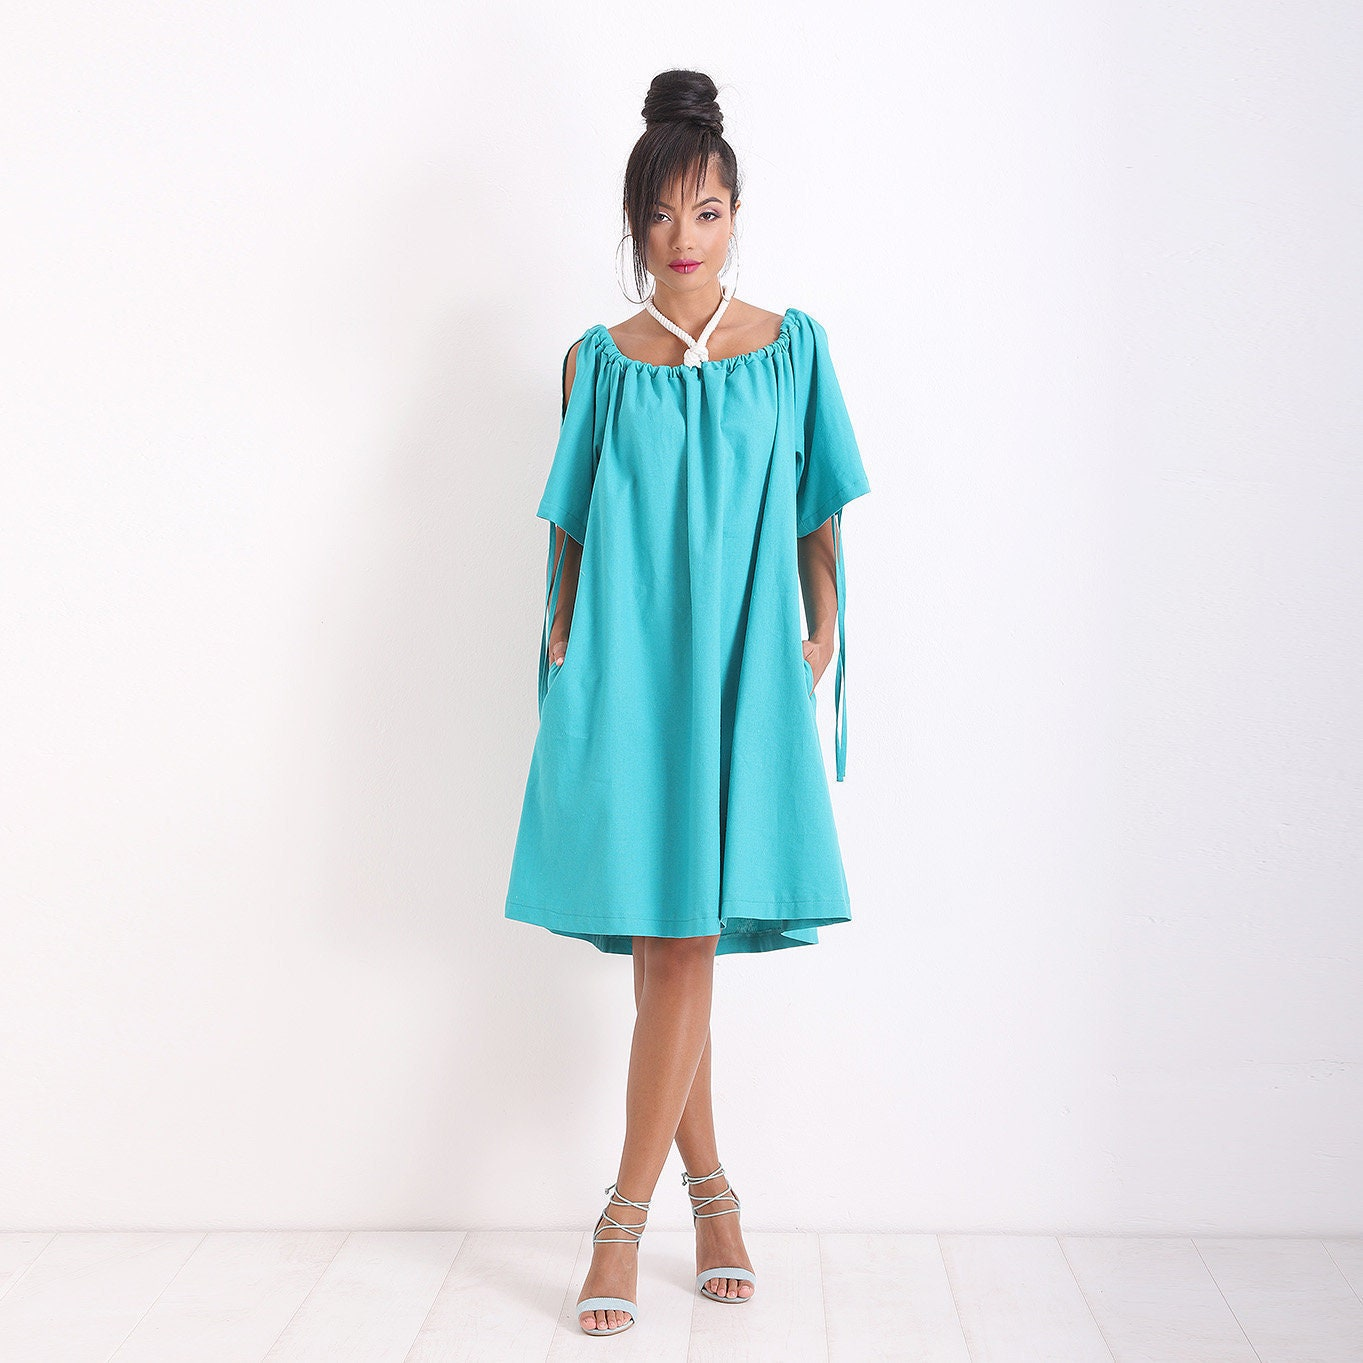 Turquoise Dress/ Maxi Dress/ Plus Size Dress/ Summer Dress/ Midi Dress/  Linen Dress/ Casual Dress/ Boho Dress/ Loose Dress/ Friends Fashion